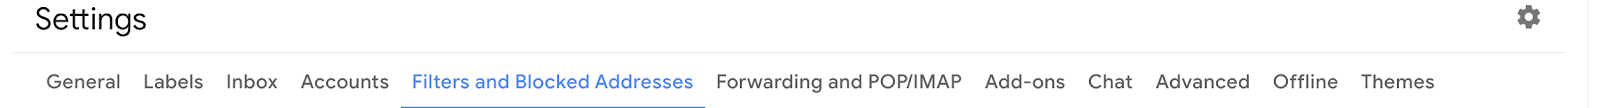 Gmail settings options